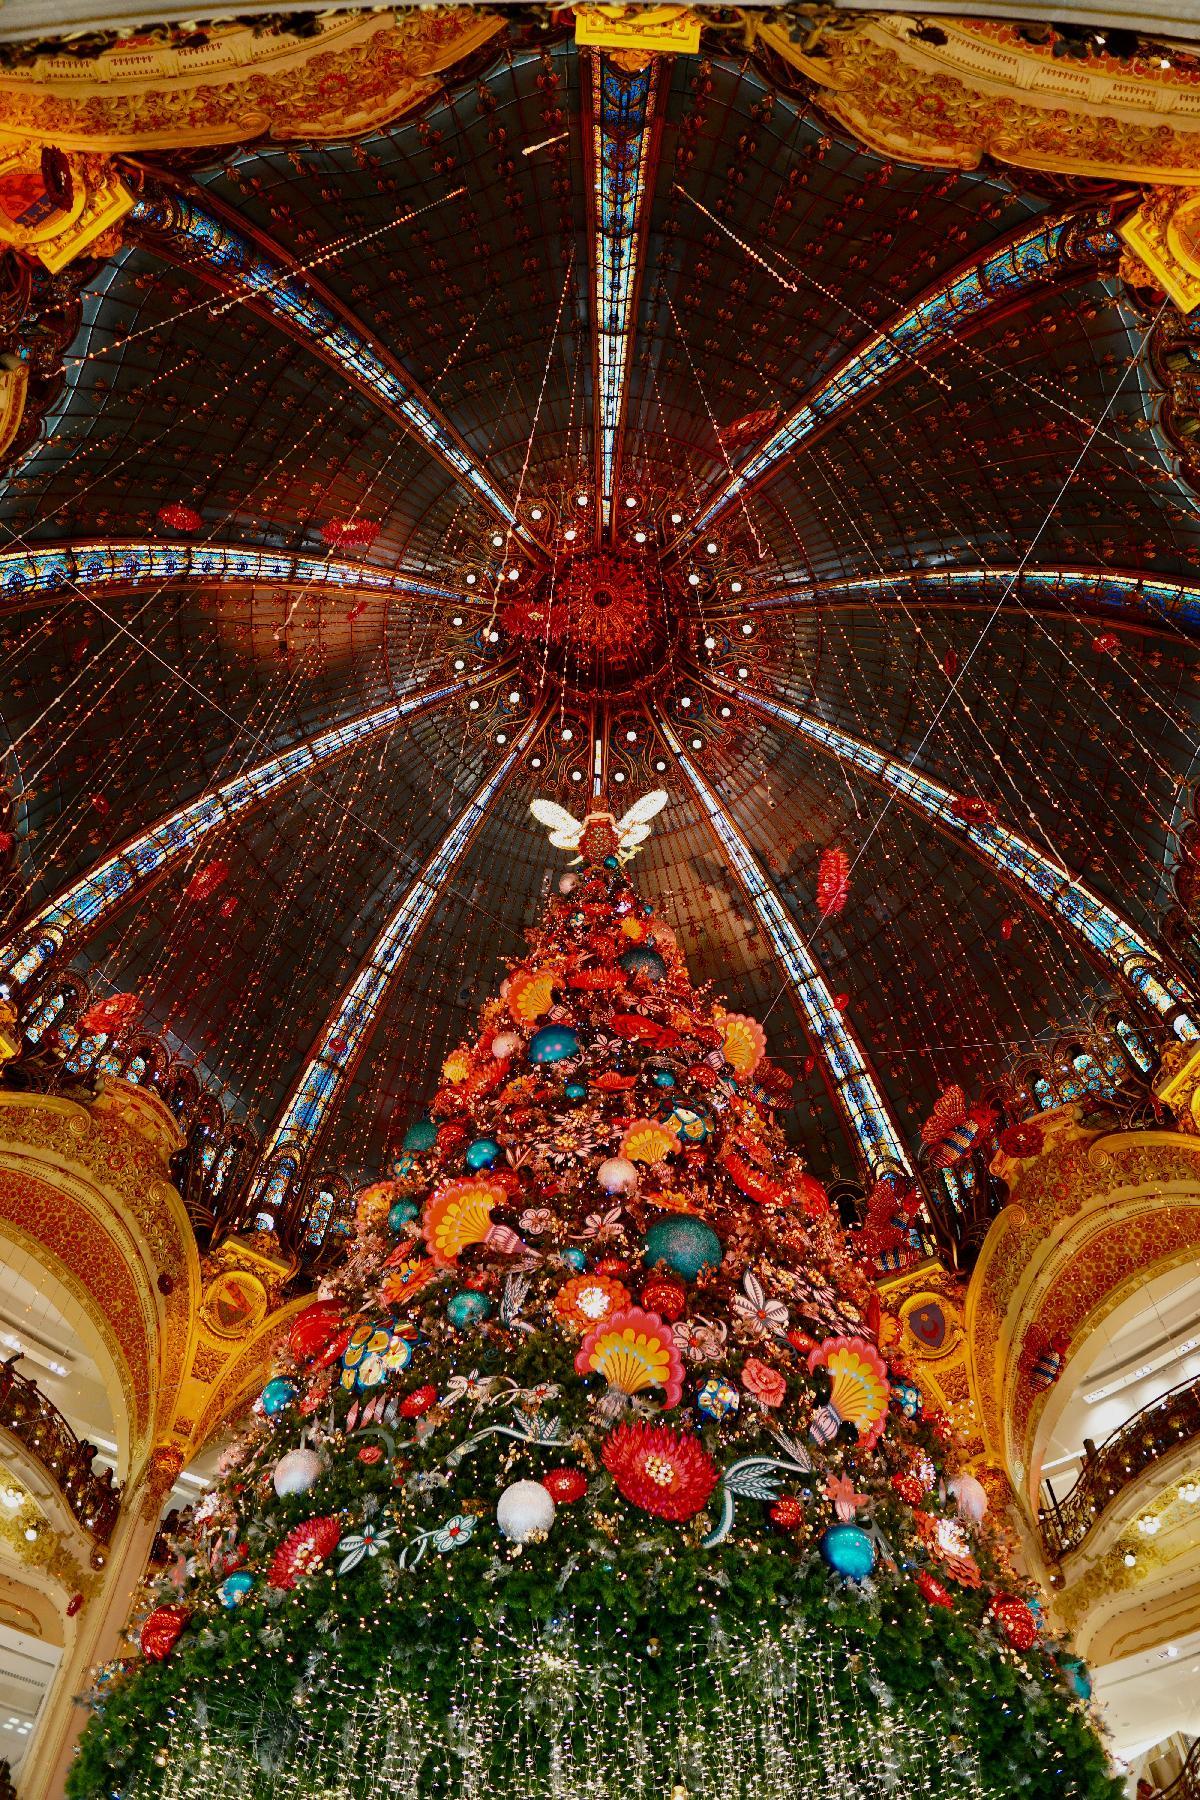 Things to do in Paris in December